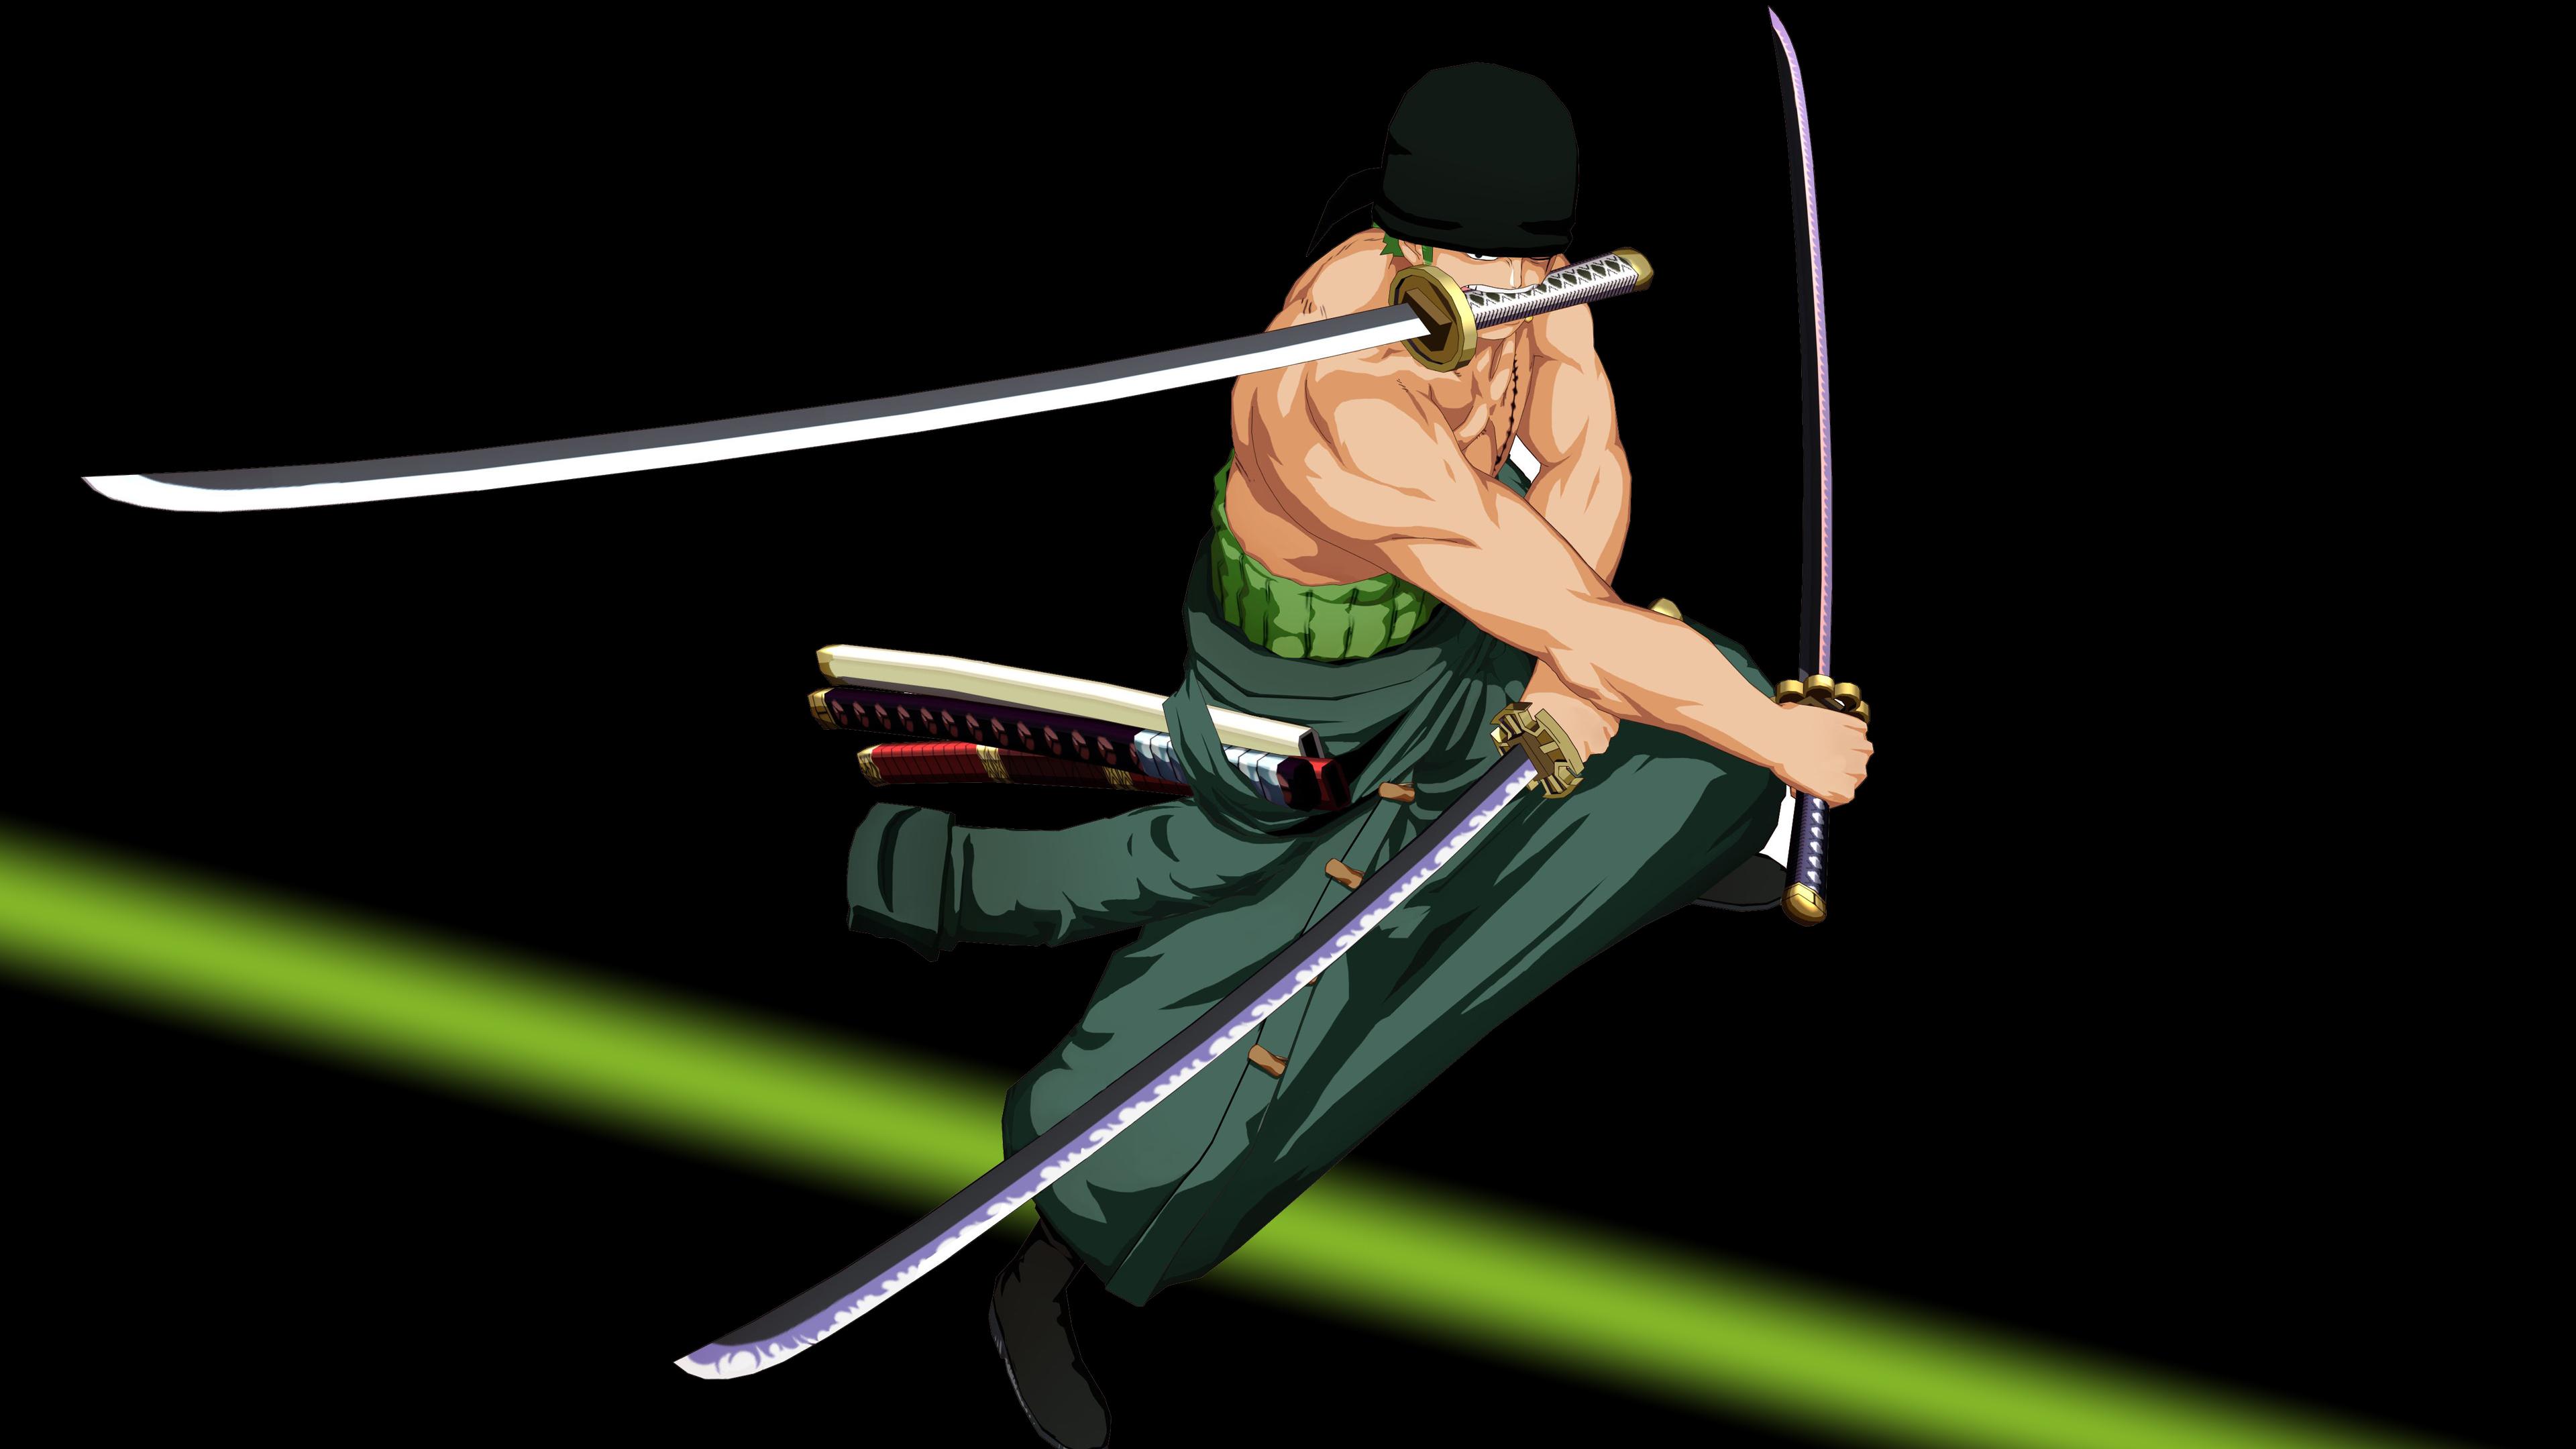 Zoro One Piece 4k Ultra HD Wallpapers 3840x2160